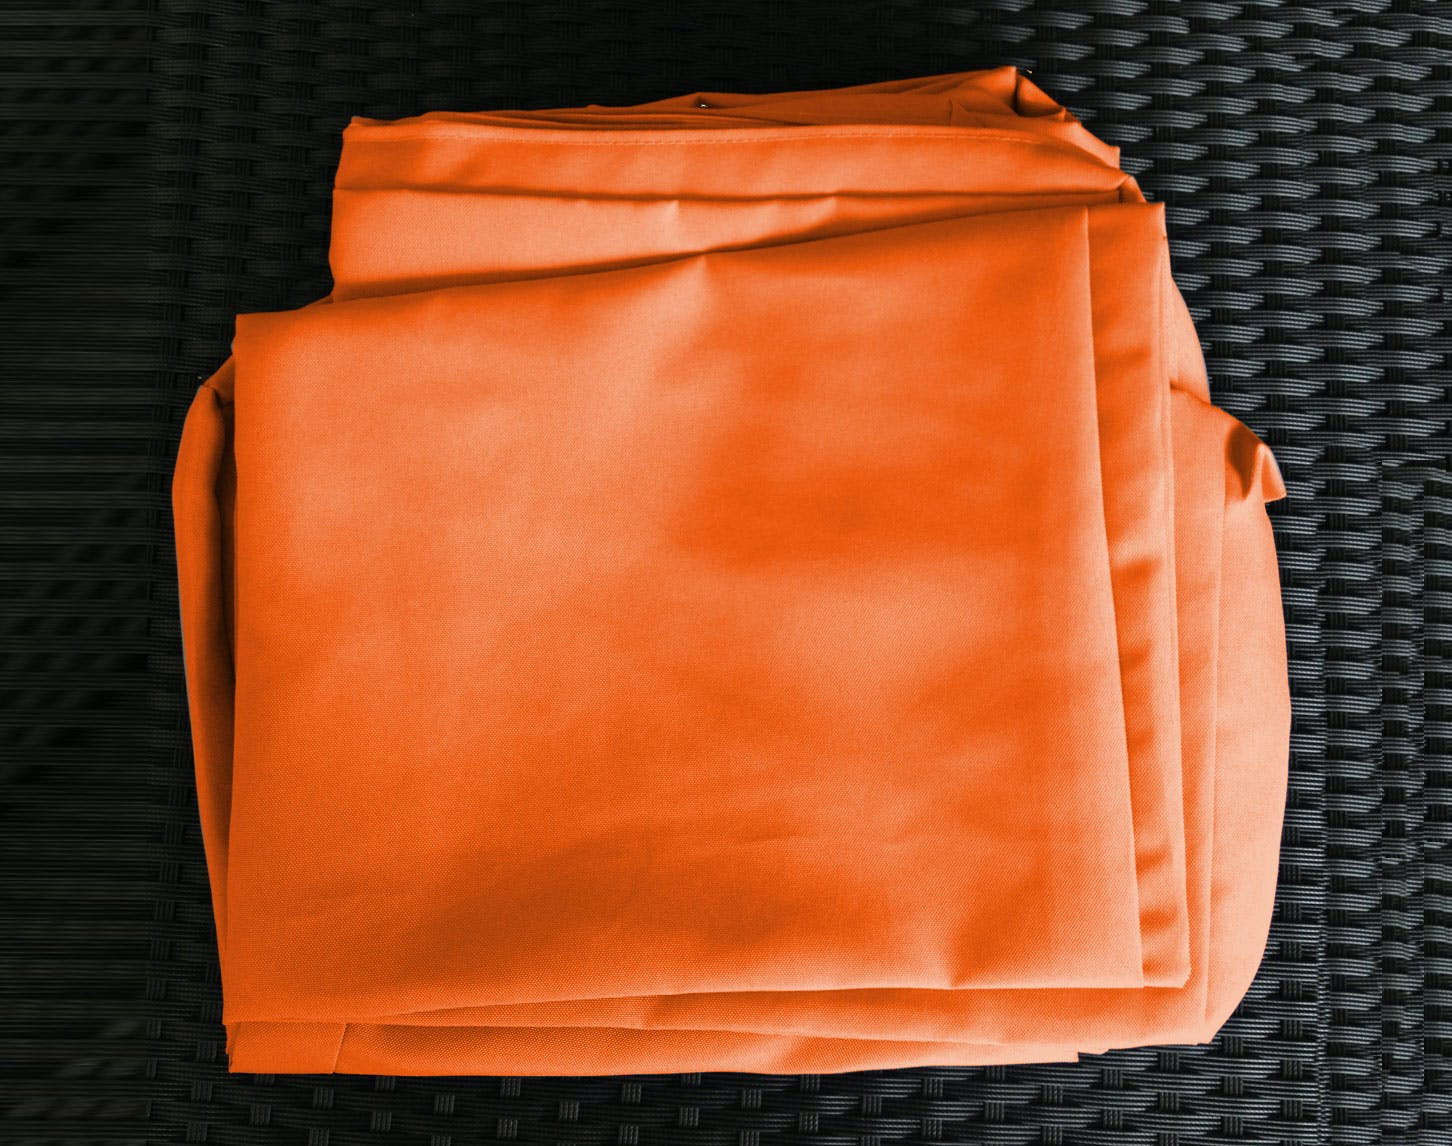 Jeu de Housses tissu orange pour Salon de Jardin AKUMAL